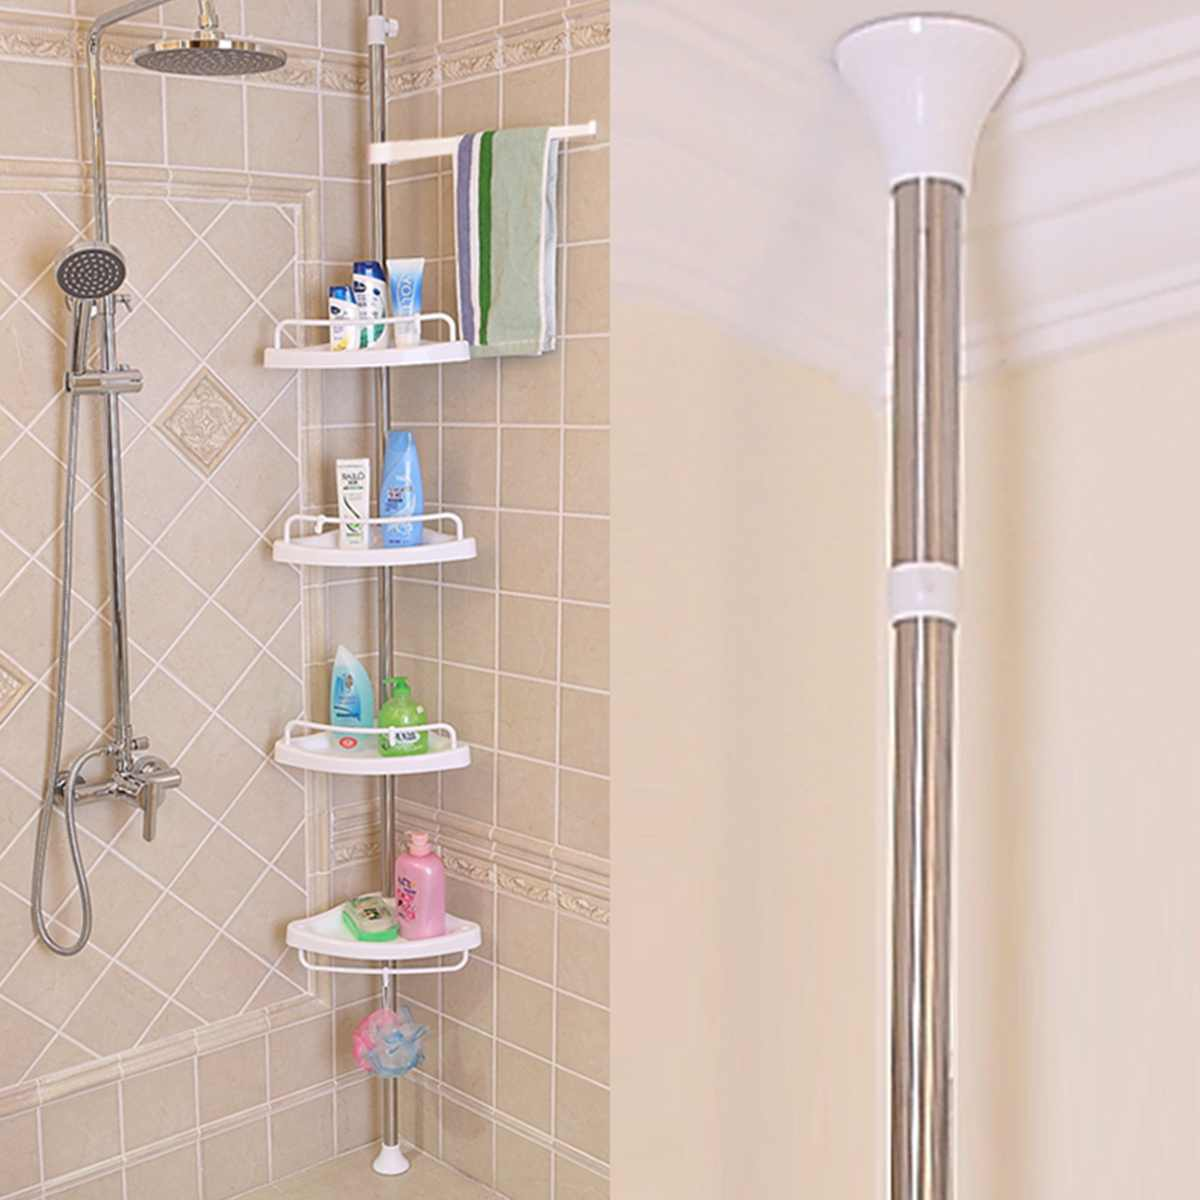 Xueqin 4 Tier Adjustable Telescopic Bathroom Corner Shower Shelf Rack Caddy Organiser 192 310cm Rust Free Pole Self Draining Bathroom Shelves Aliexpress